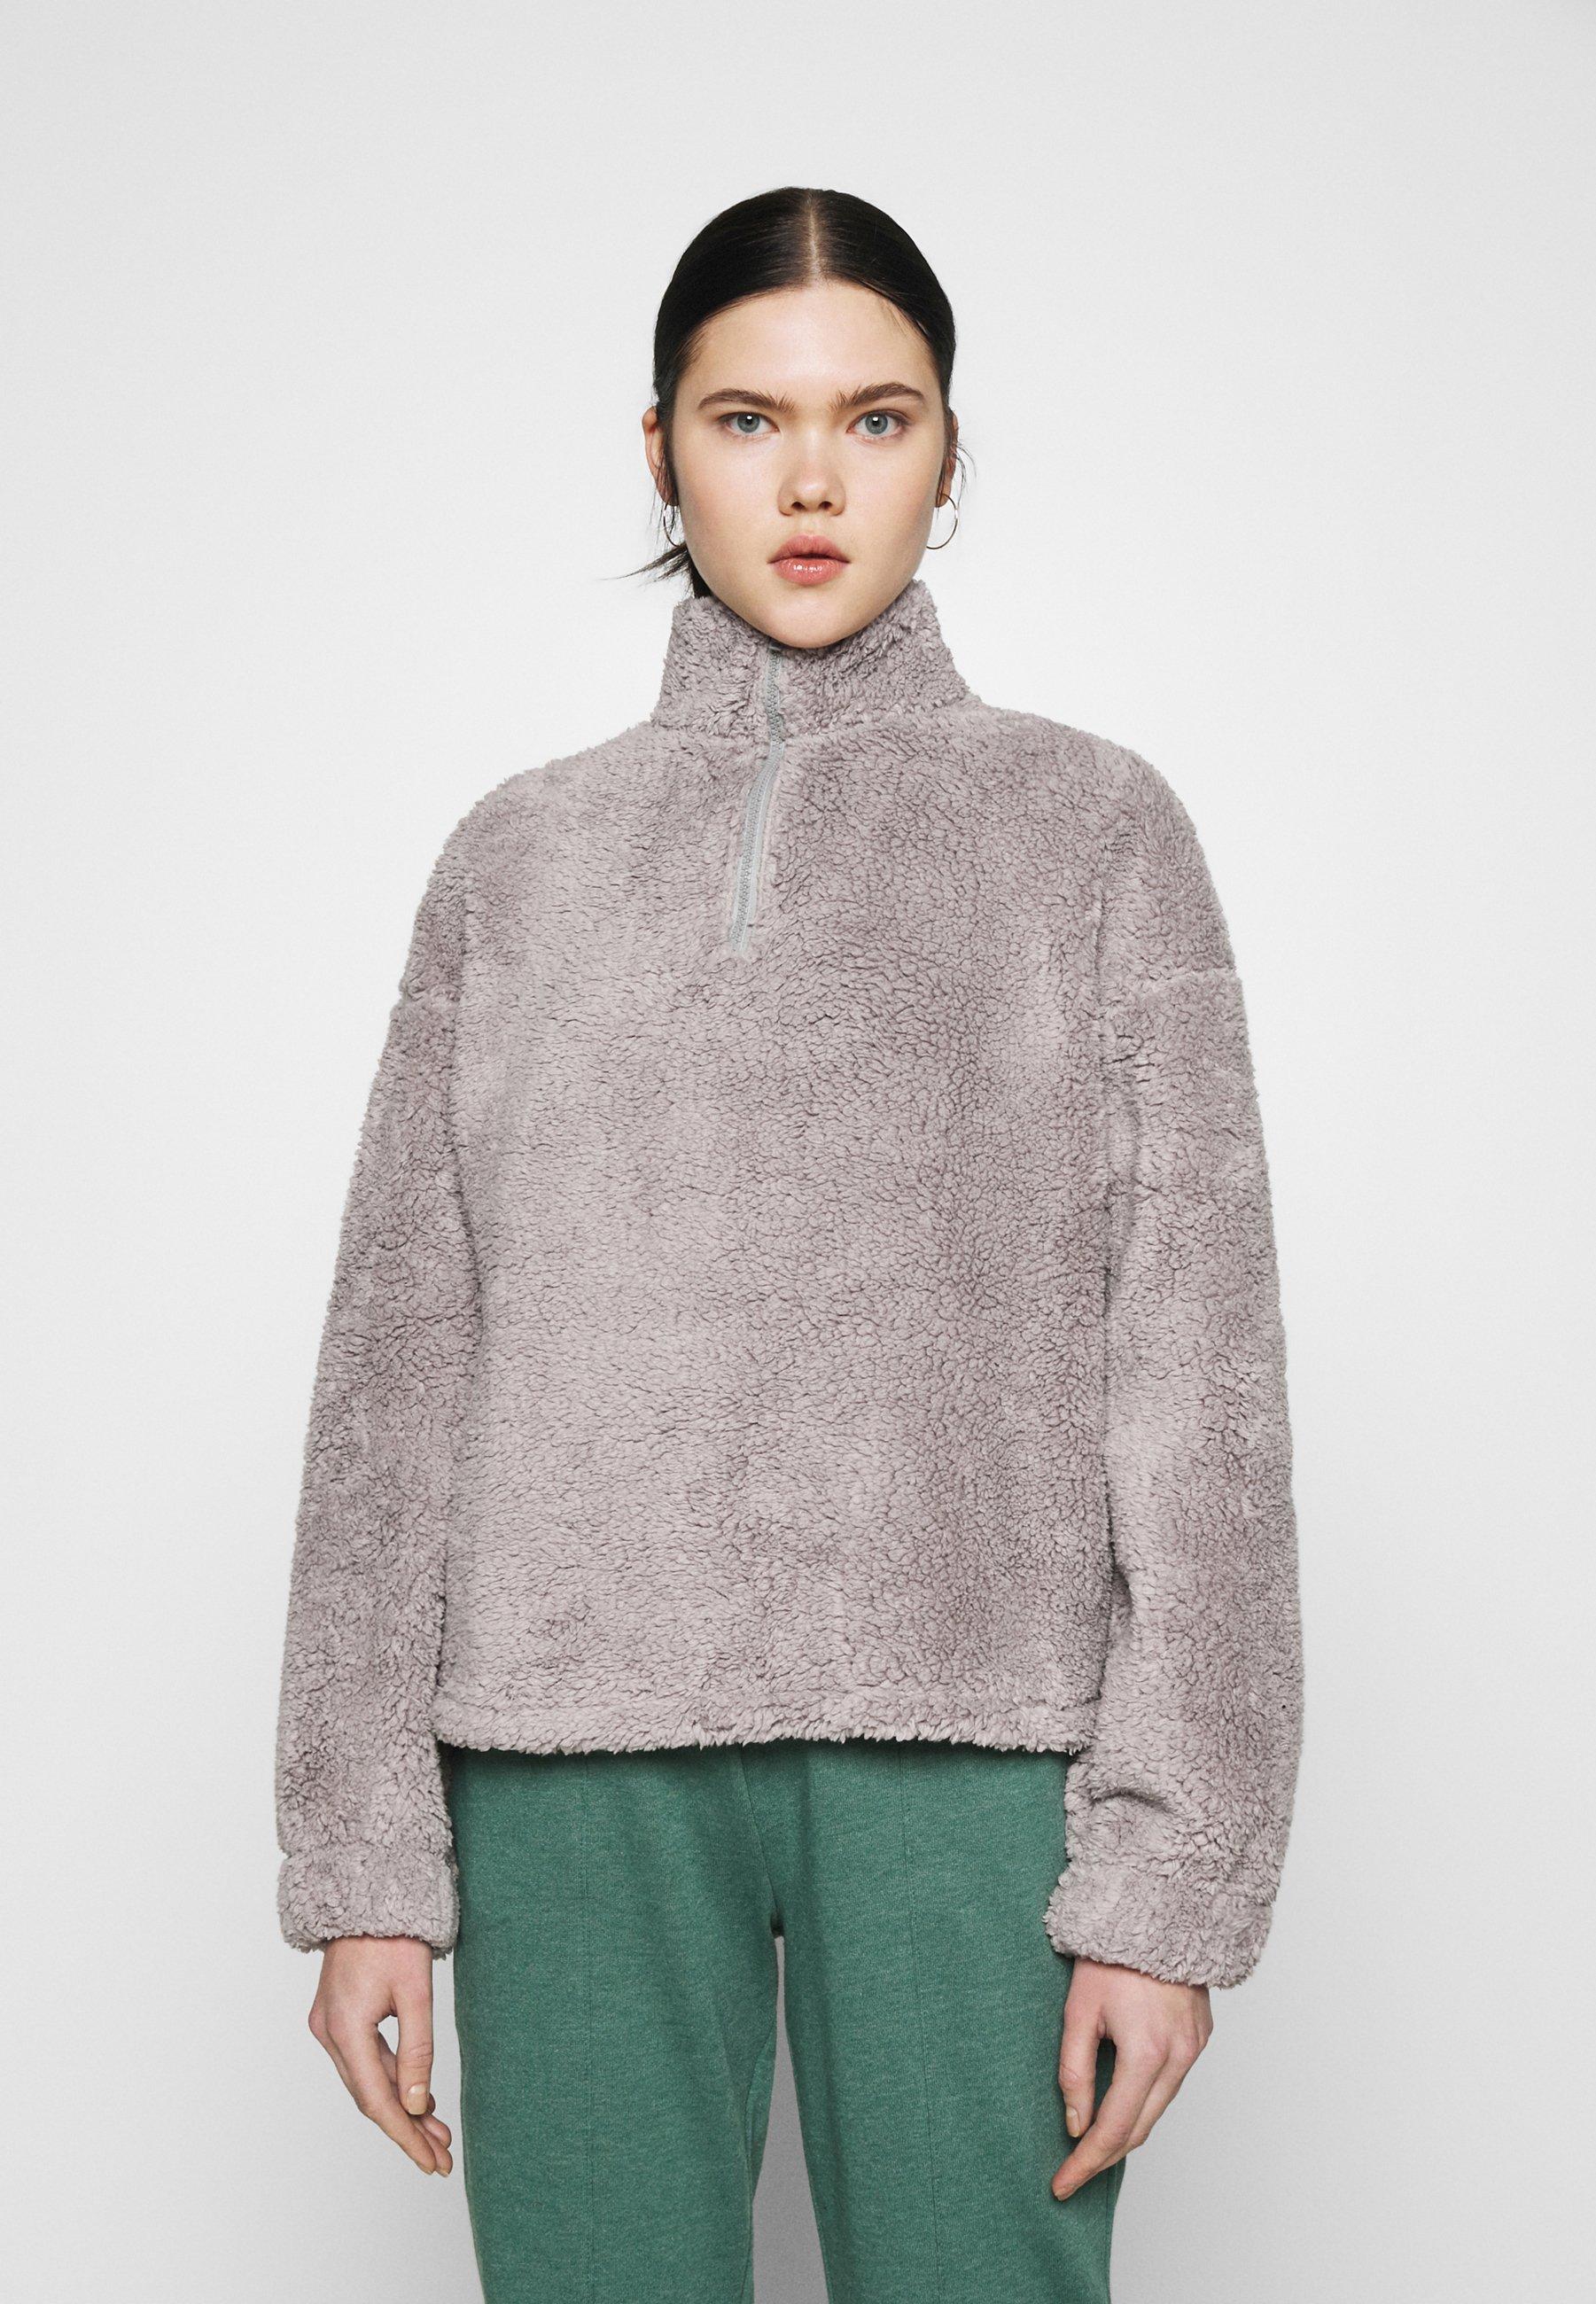 Femme HALF ZIP - Sweat polaire - gray